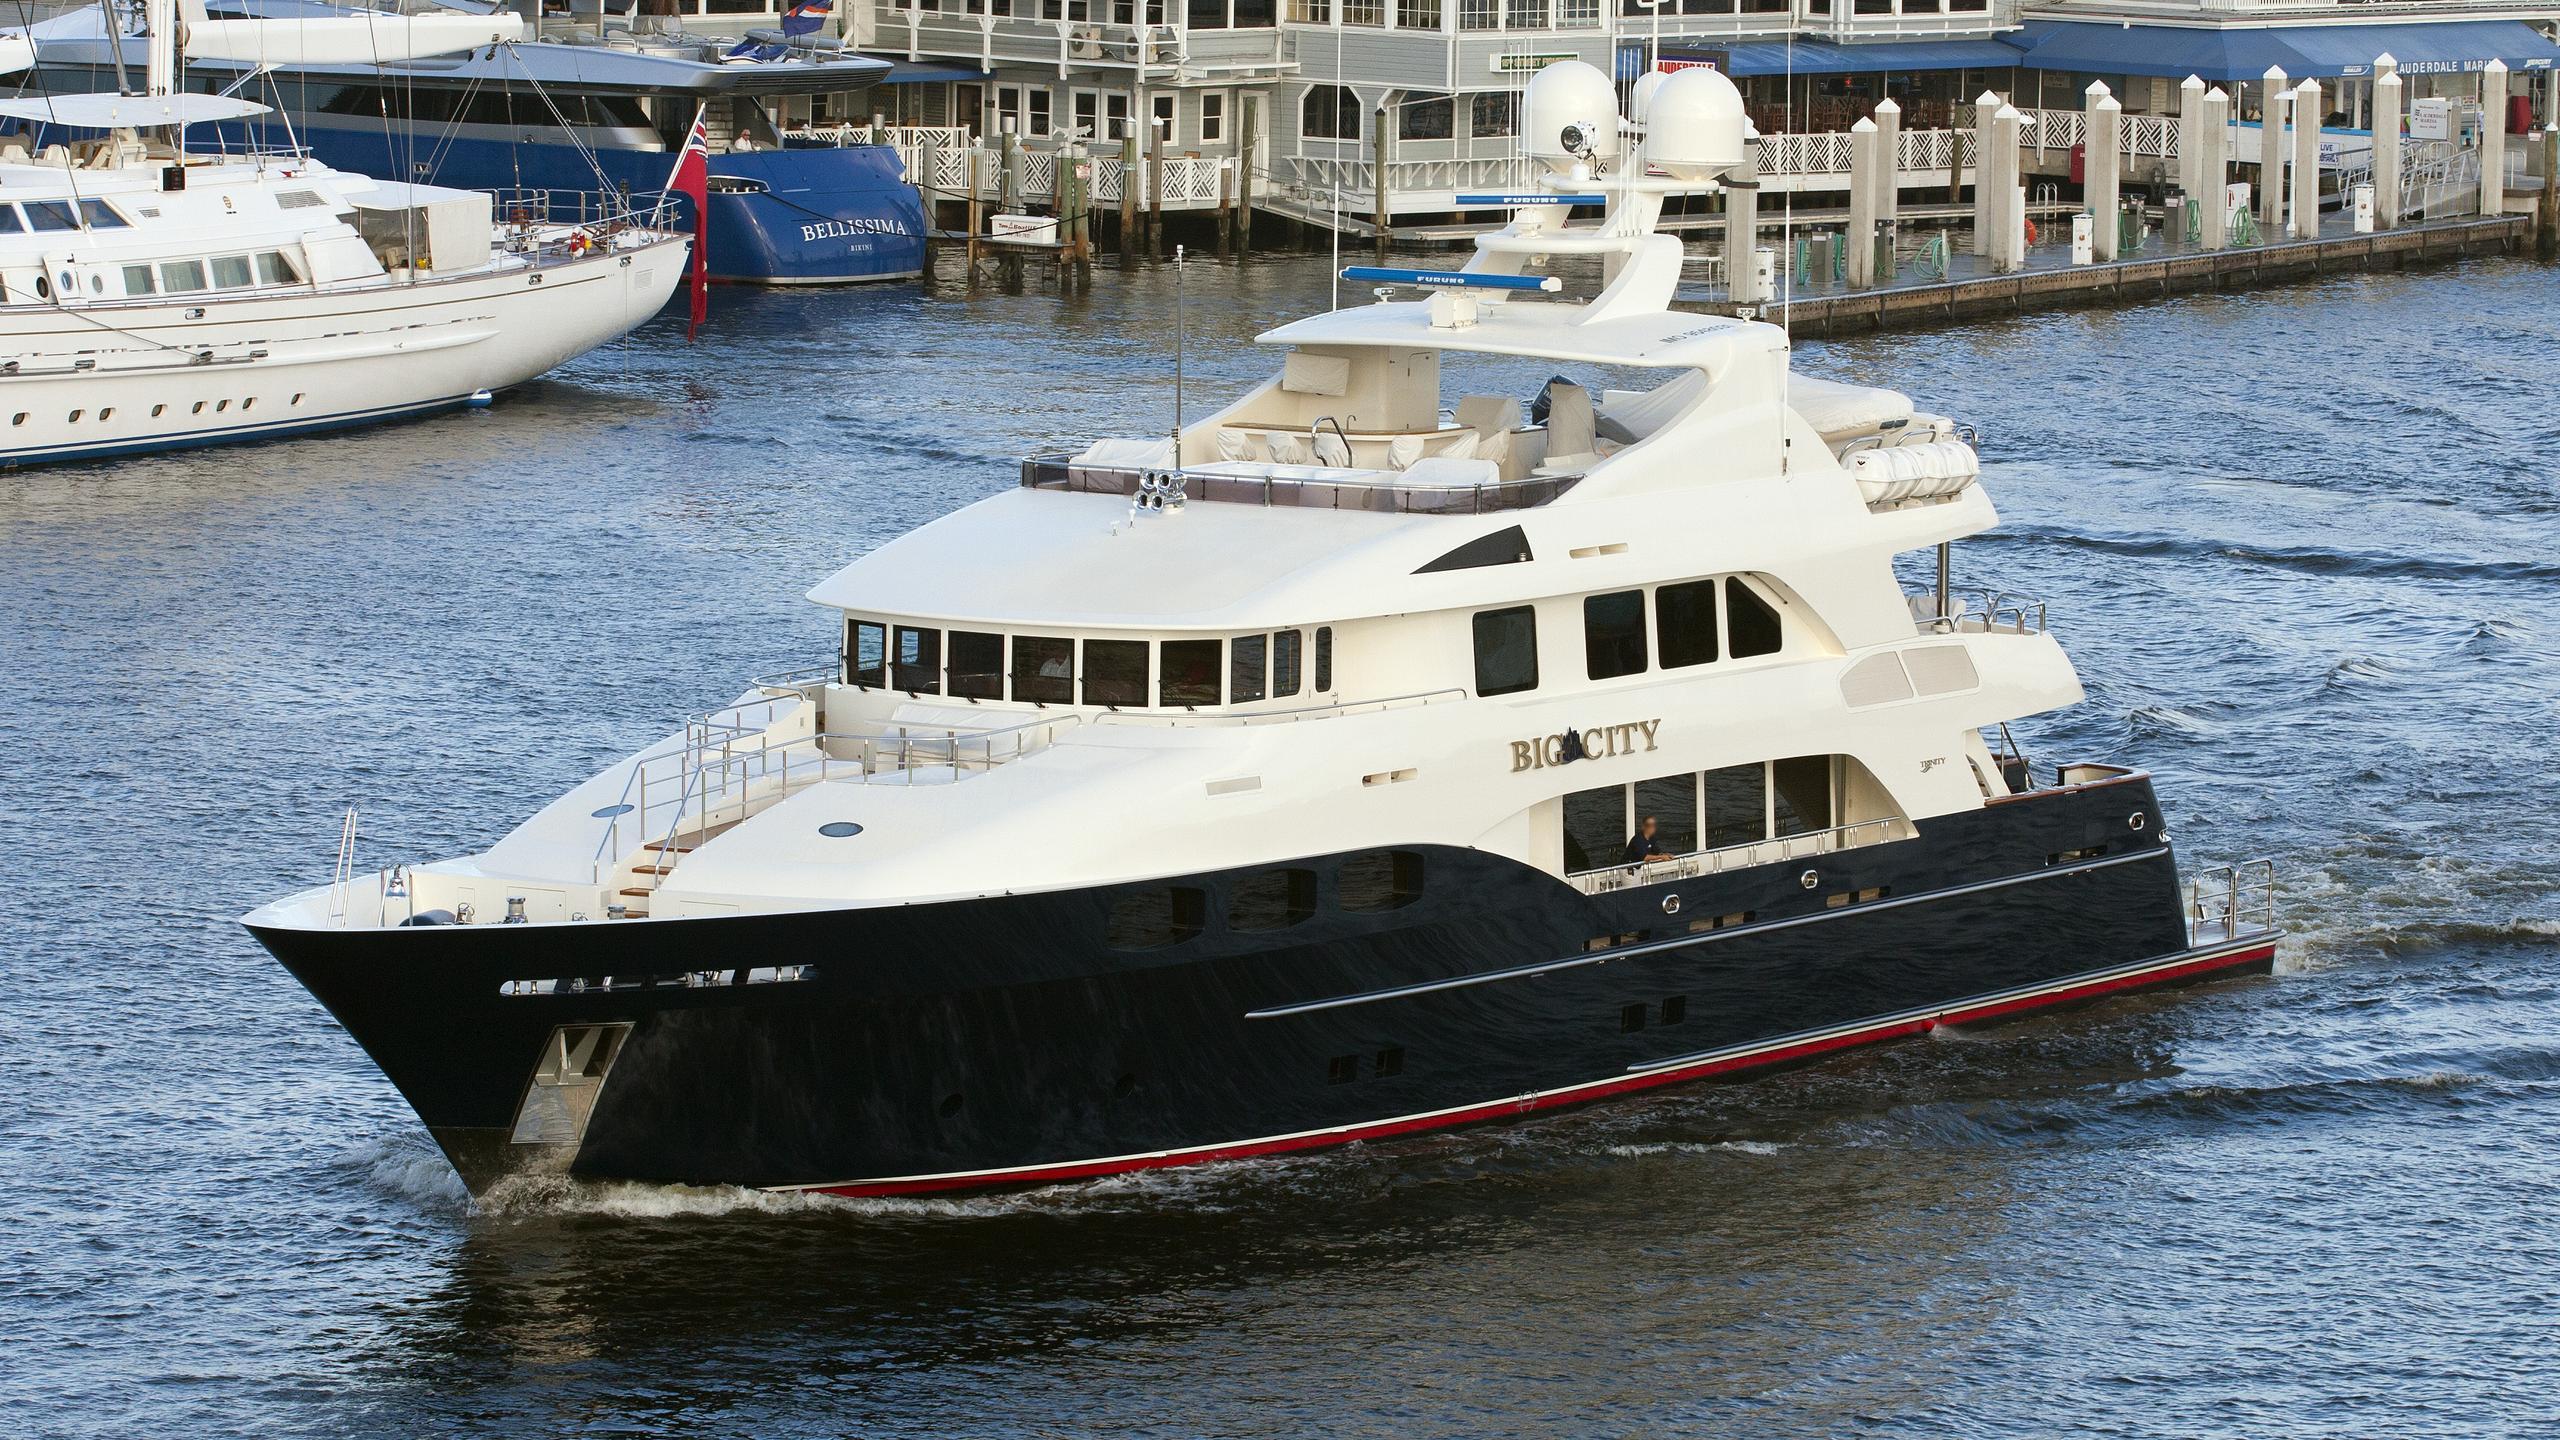 waku-motor-yacht-trinity-2009-43m-running-half-profile